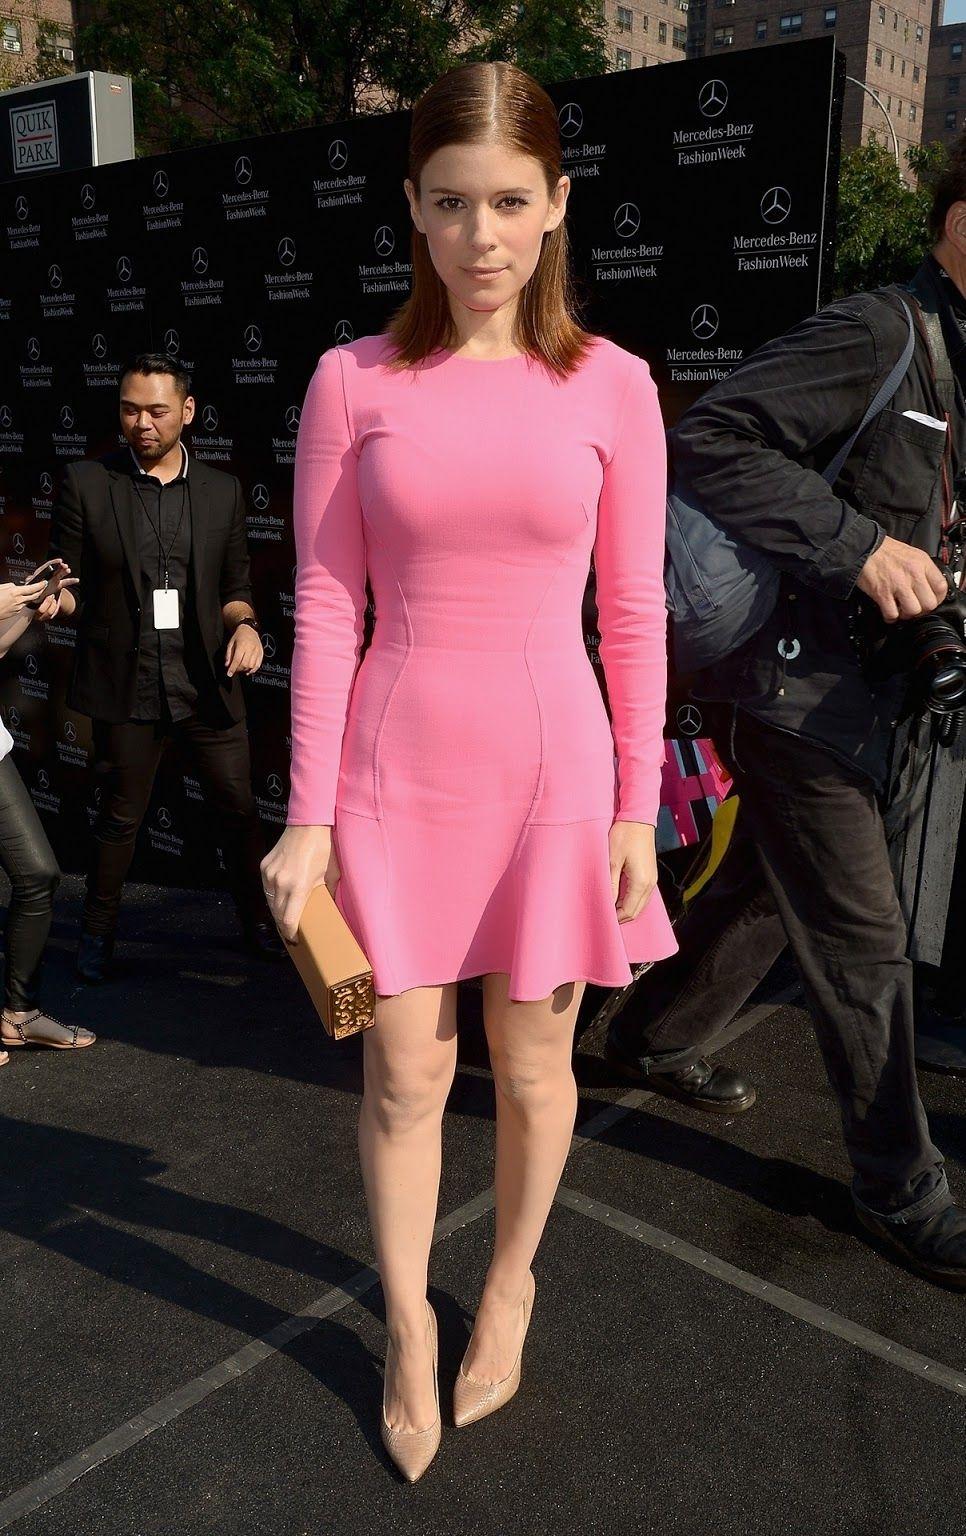 Kate Mara Bra Size And Body Measurements Kate Mara Kate Mara Hot Beautiful Actresses